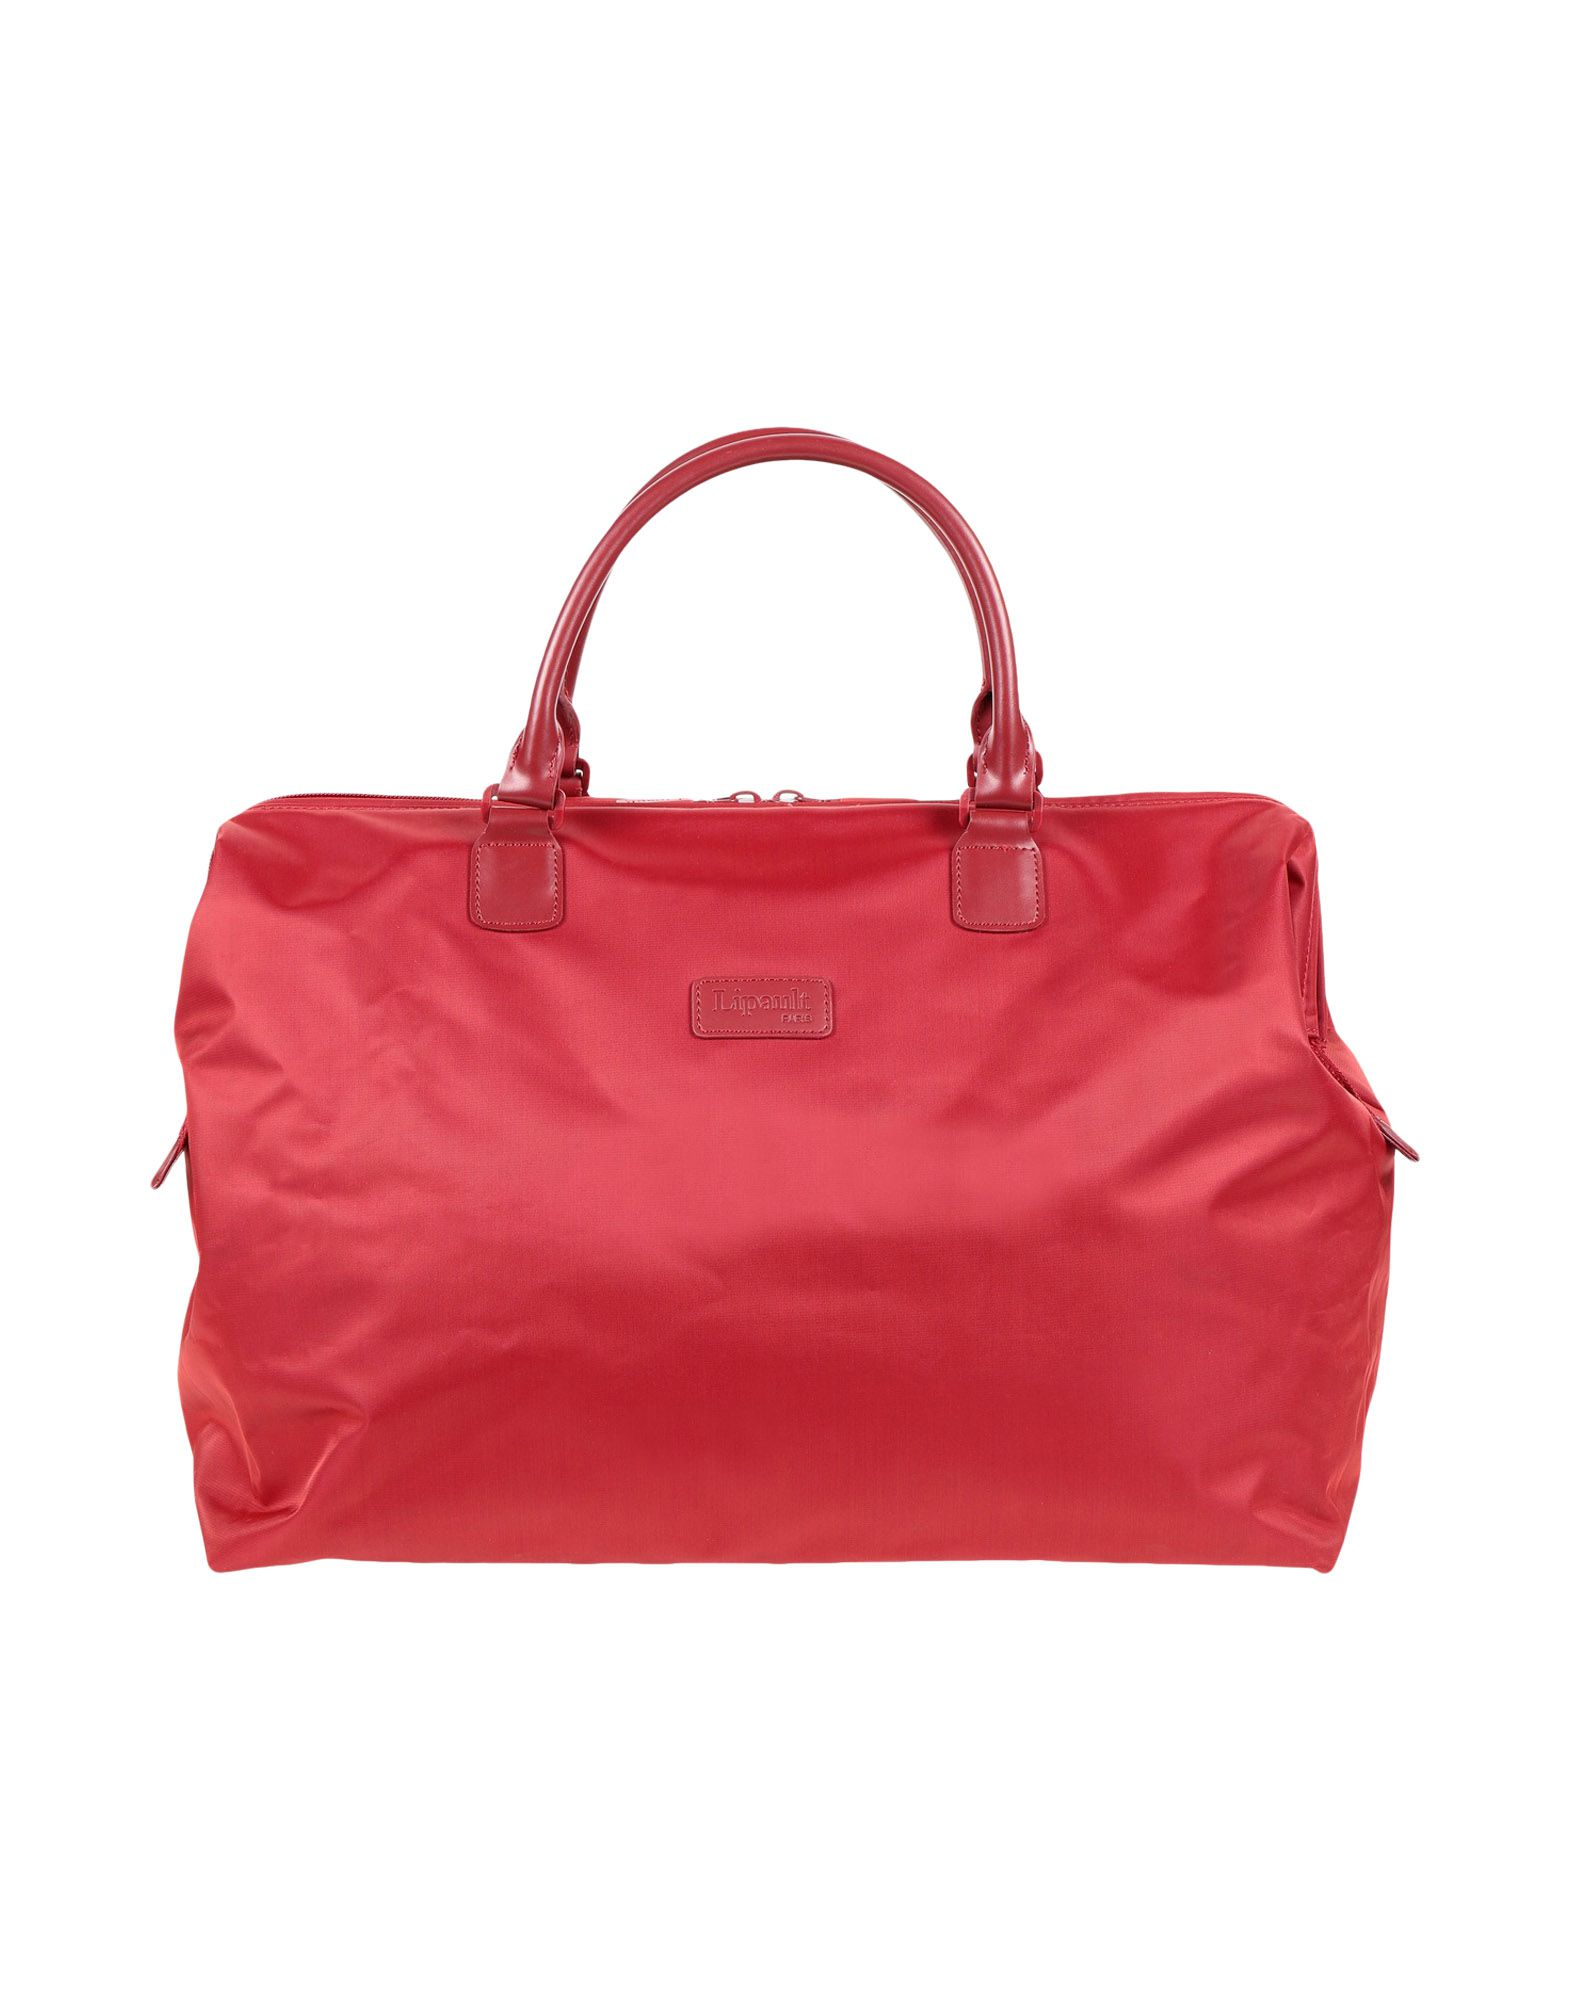 LIPAULT Дорожная сумка lipault дорожная сумка